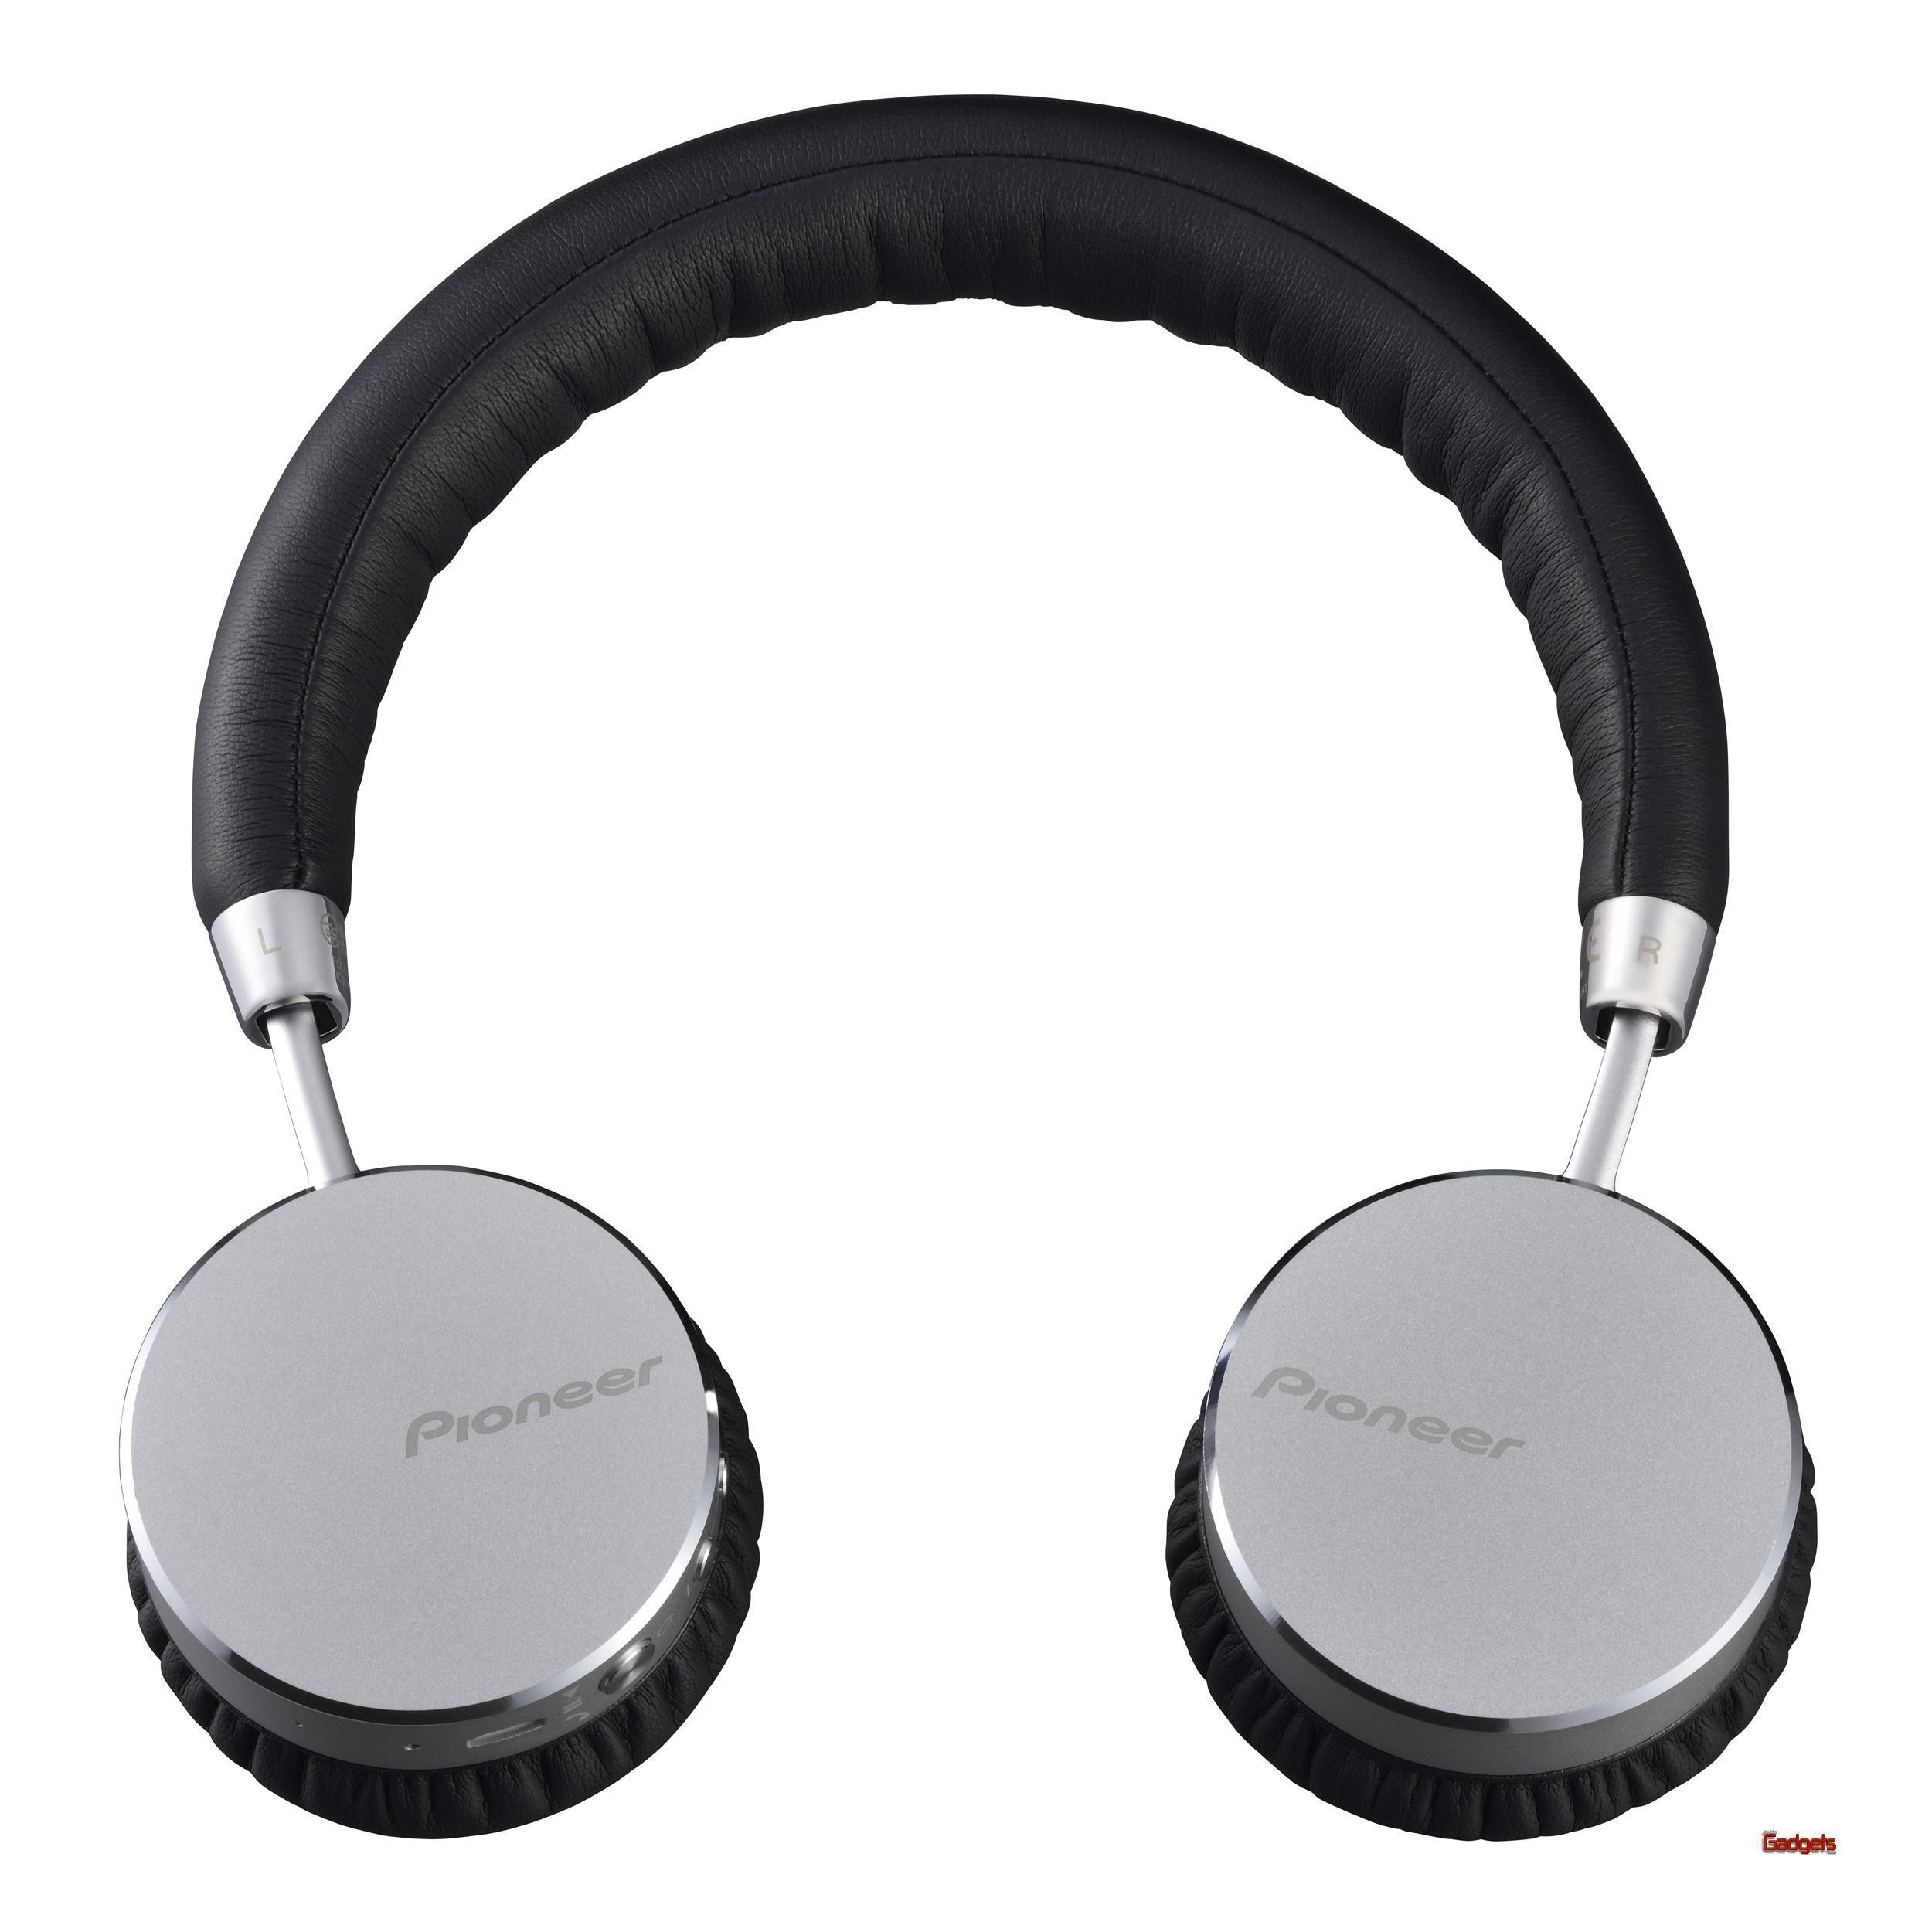 Pioneer-Audifonos-Bluetooth-SE-MJ561BT-03